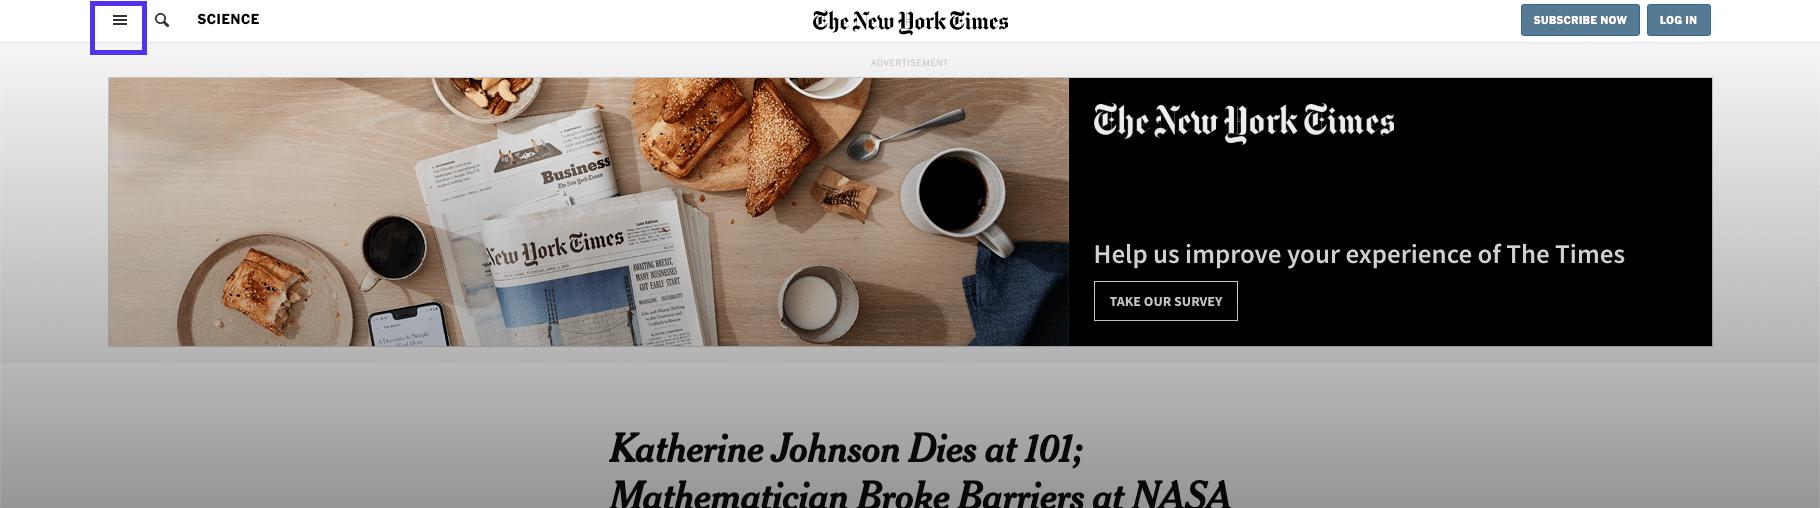 The New York Timesの記事 – ヘッダーメニュー